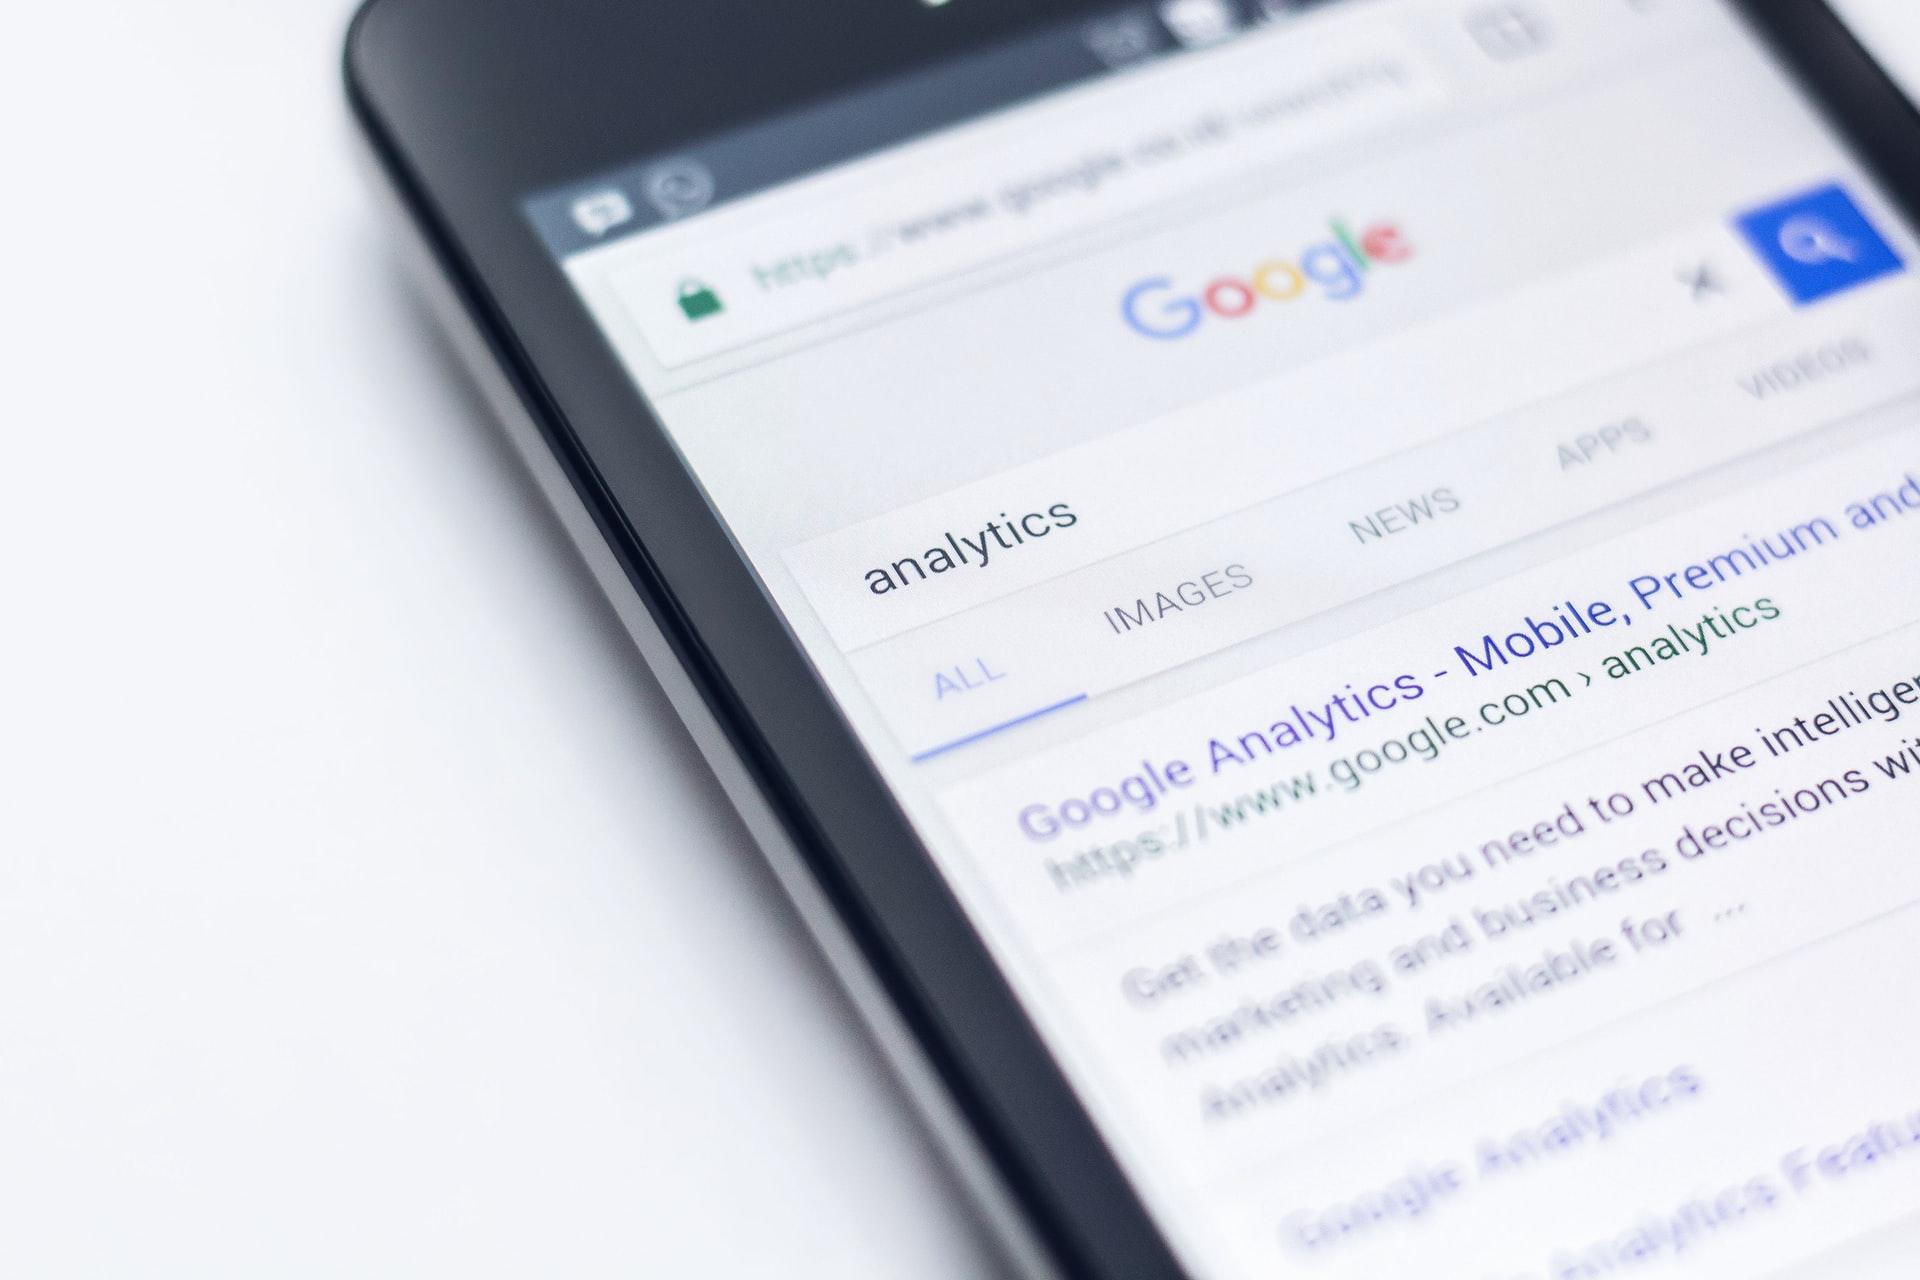 Come funziona Google Analytics